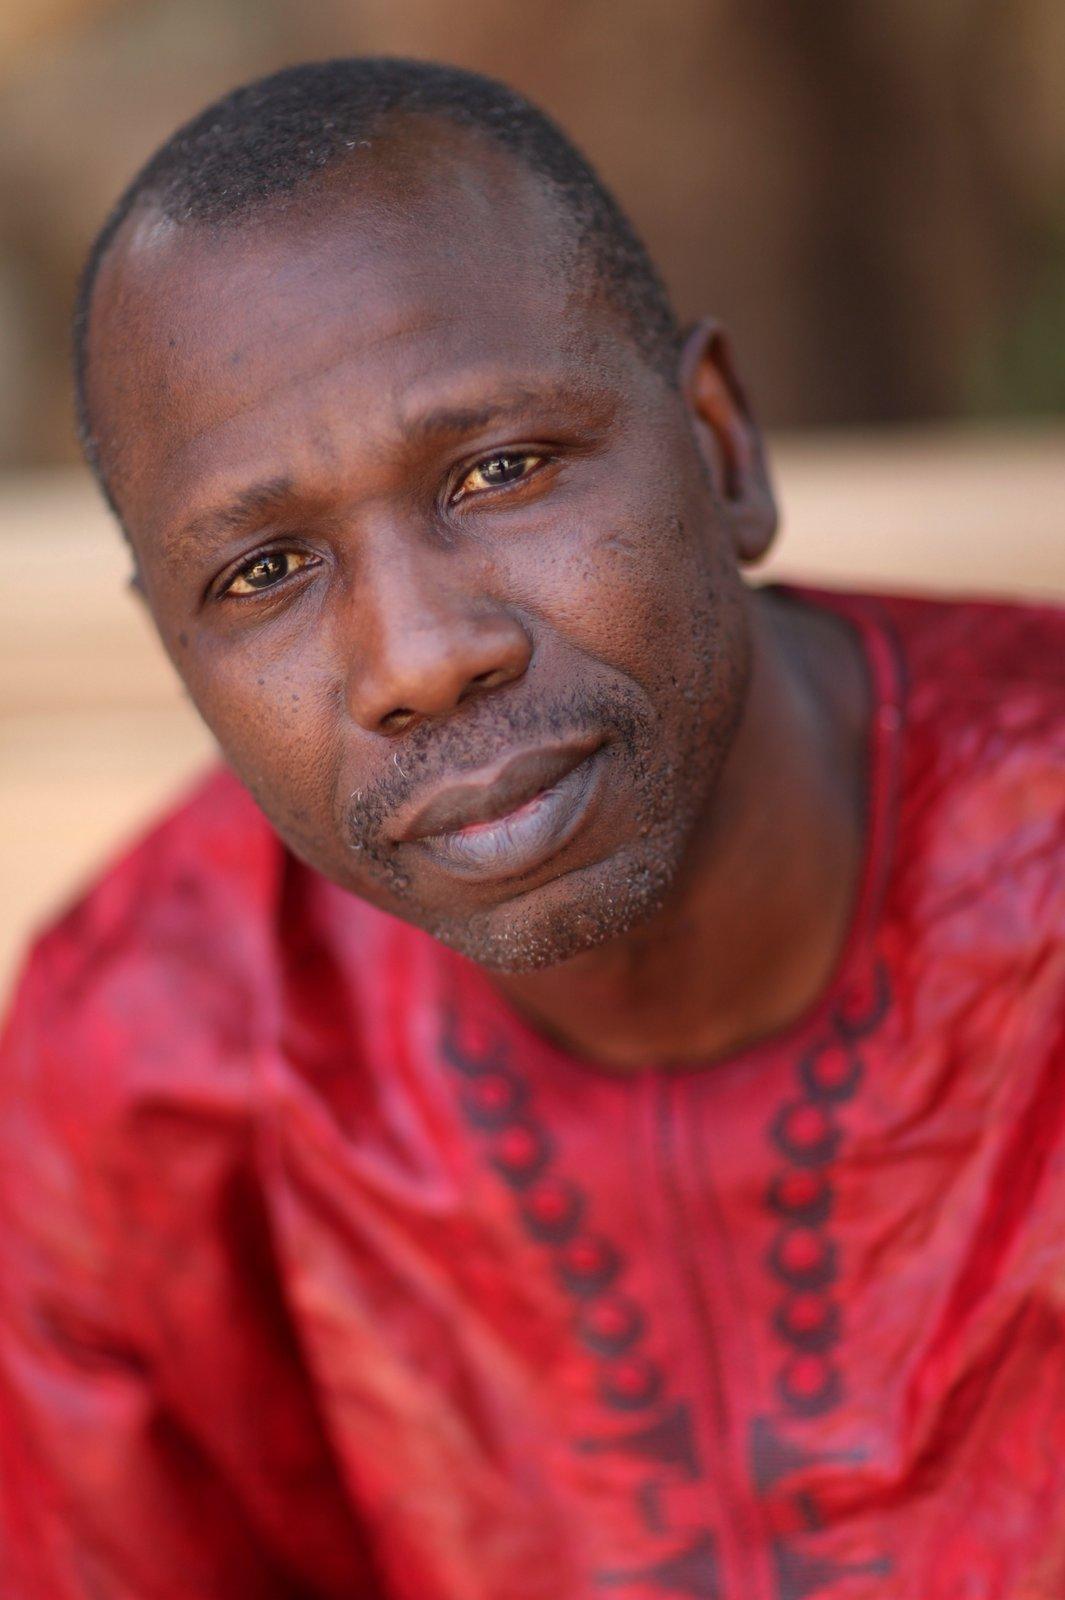 Malian kora player Ballaké Sissoko